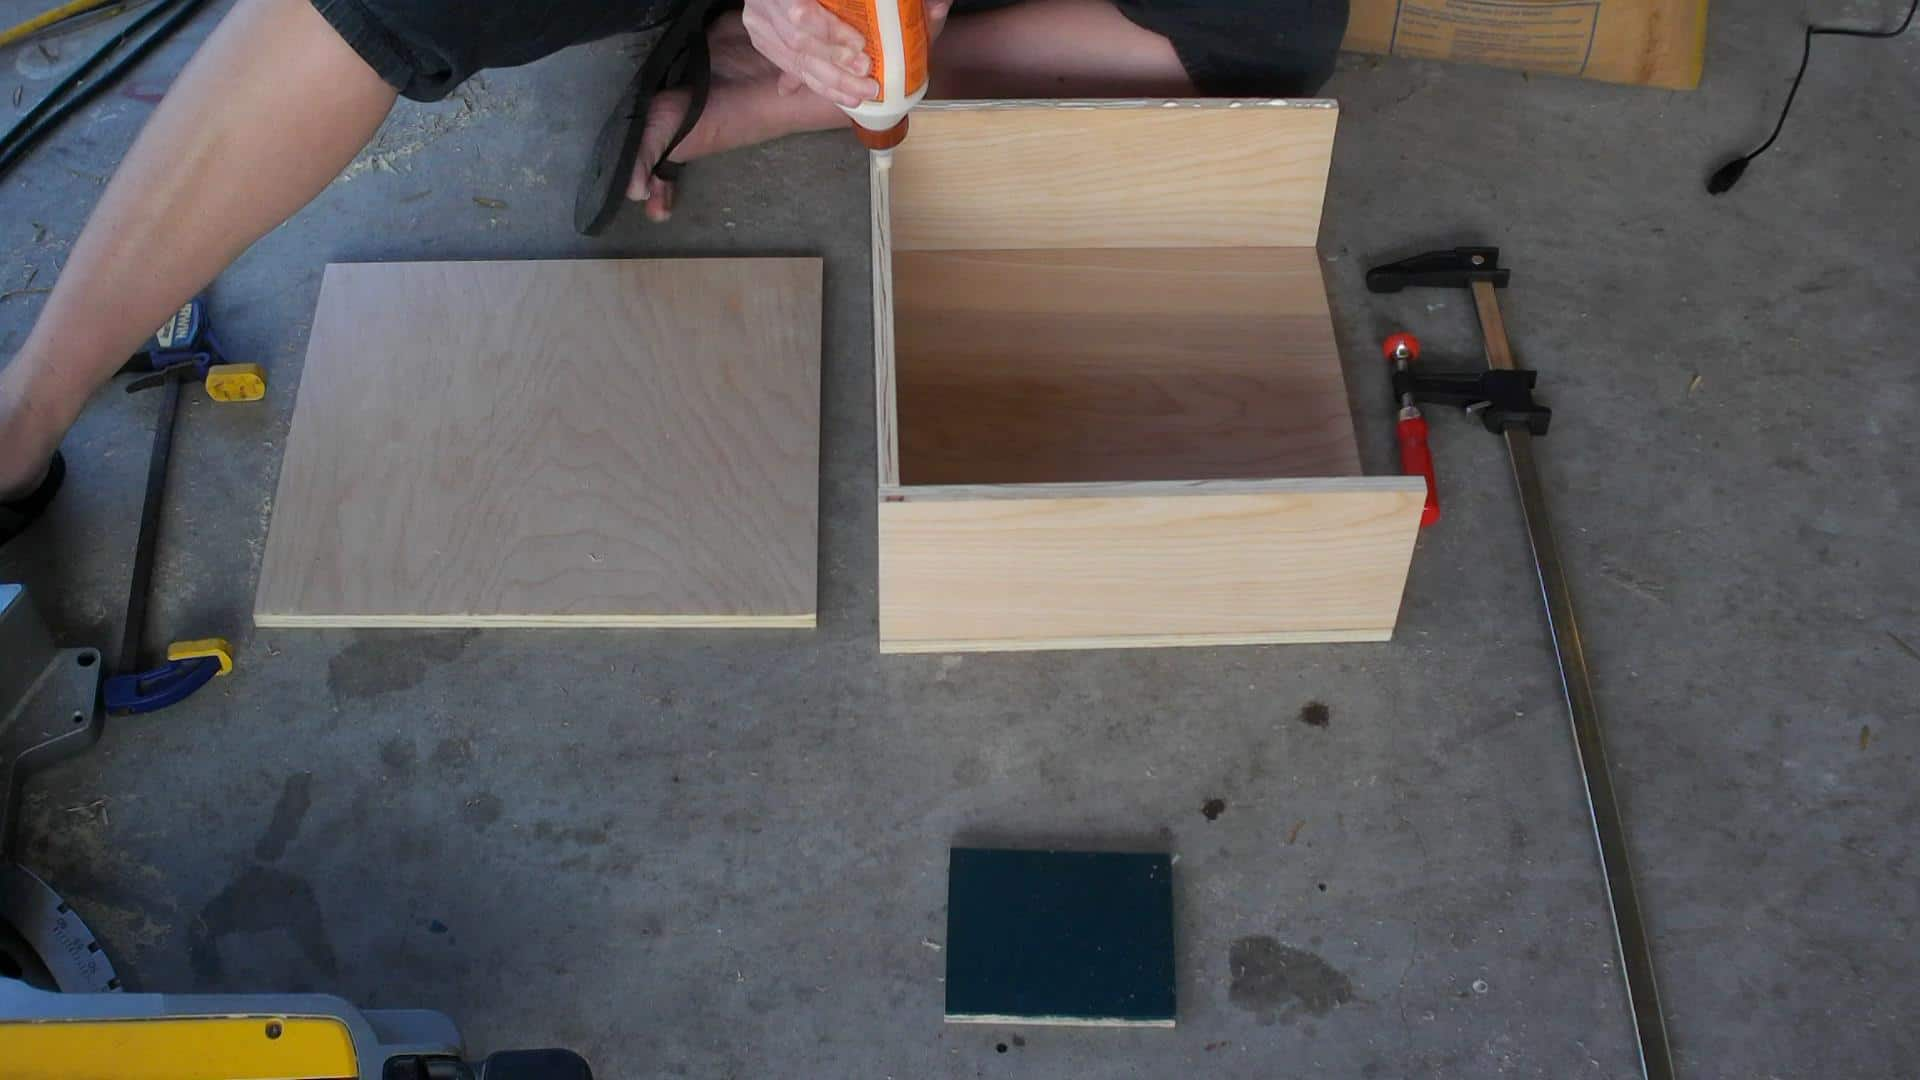 Building the vinyl record storage